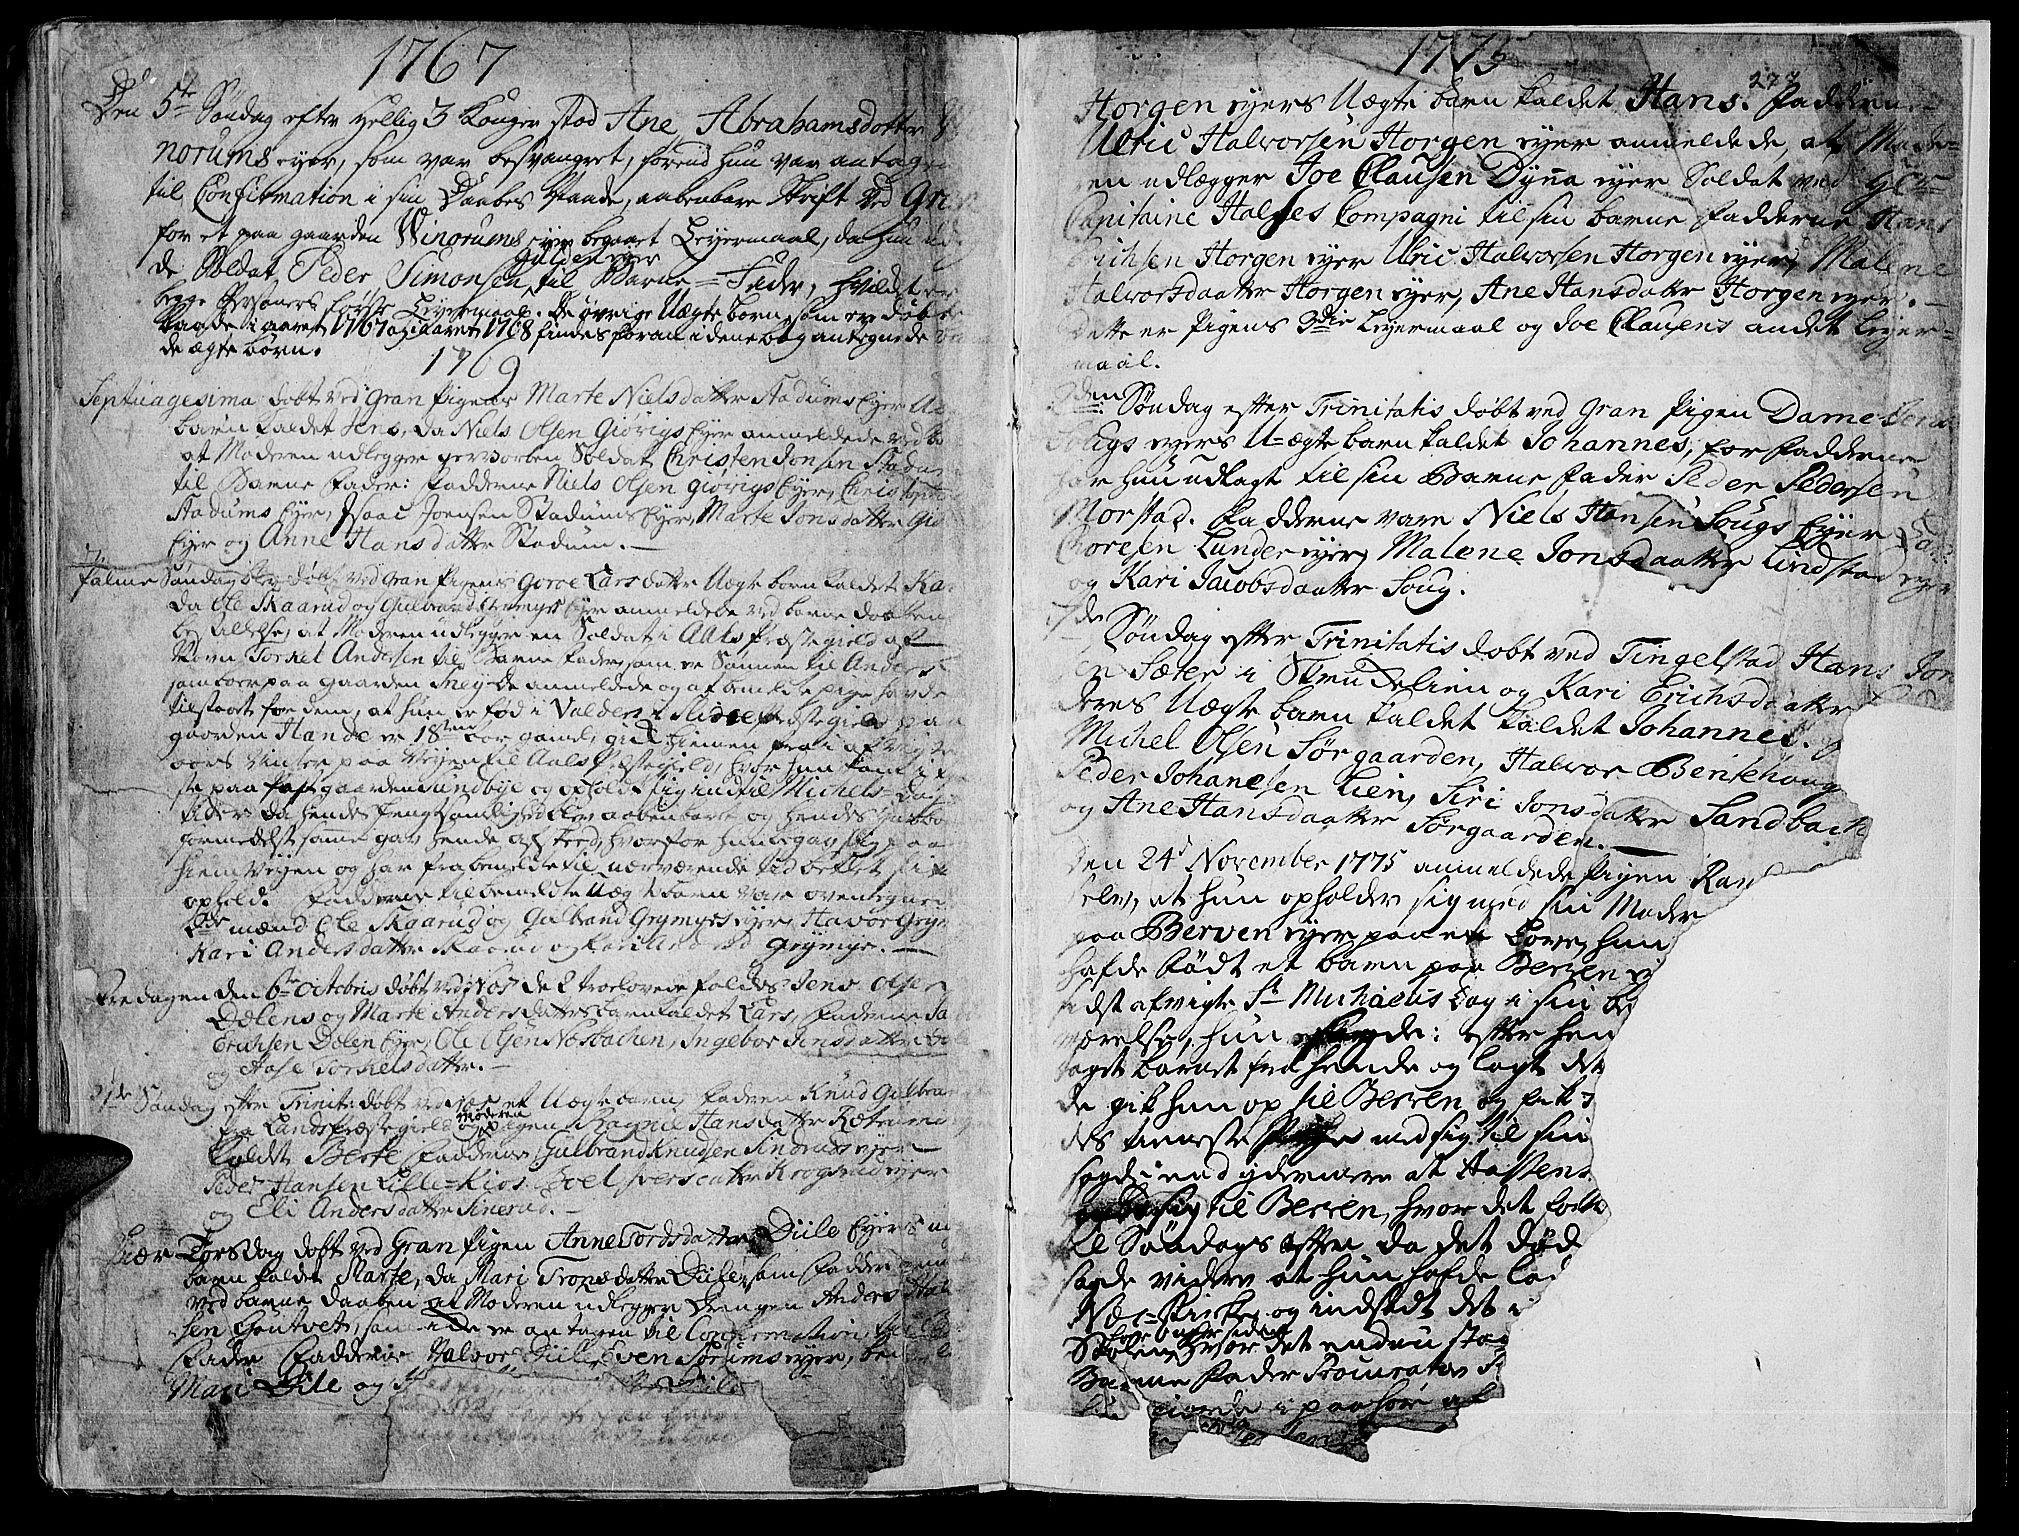 SAH, Gran prestekontor, Ministerialbok nr. 4, 1759-1775, s. 277